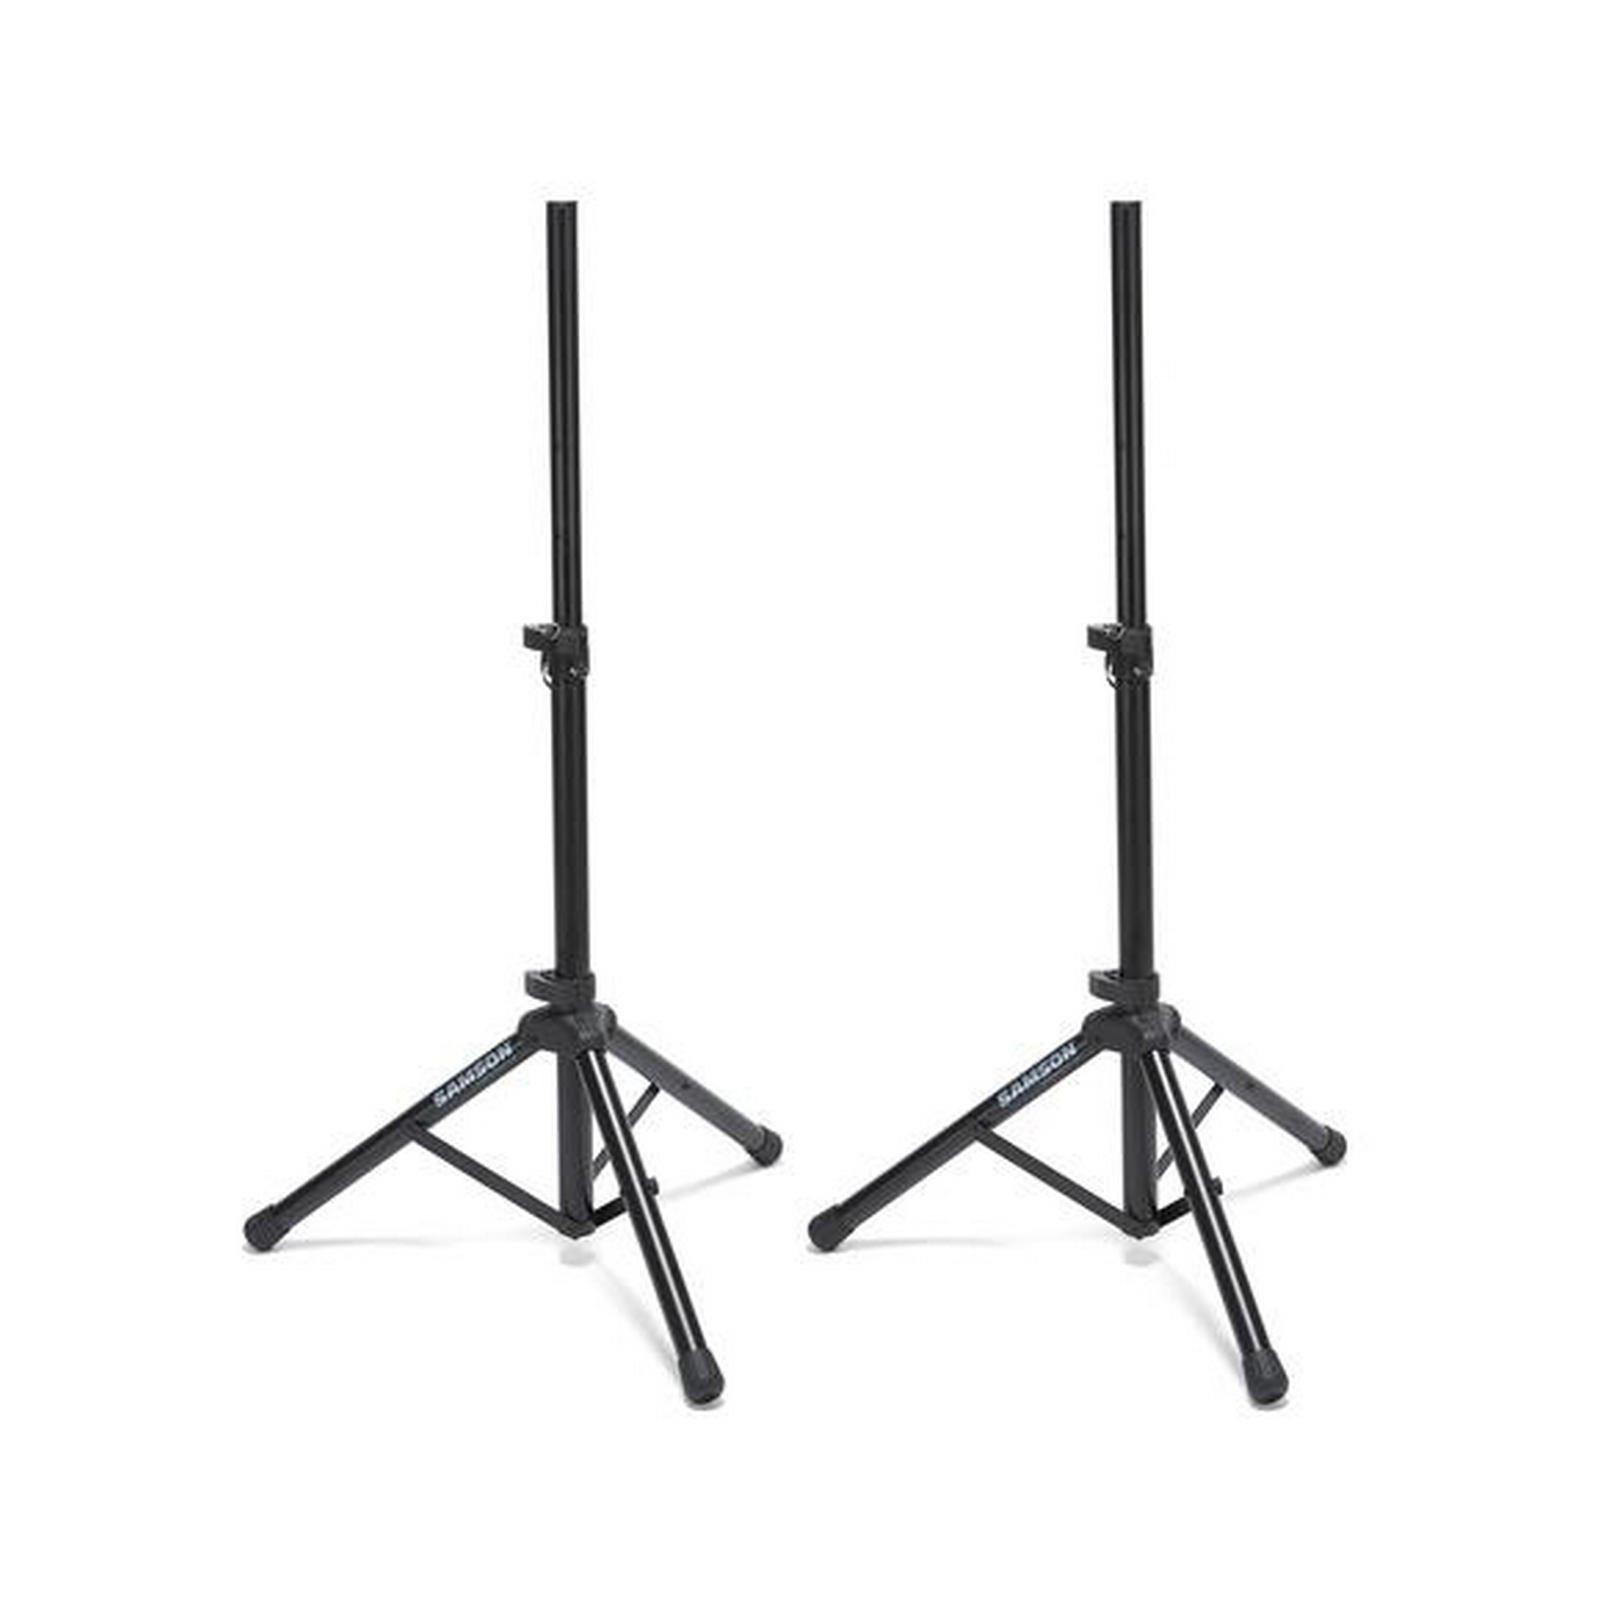 Samson SP50P | Aluminum Speaker Stand Set Pair by Samson (Image #3)